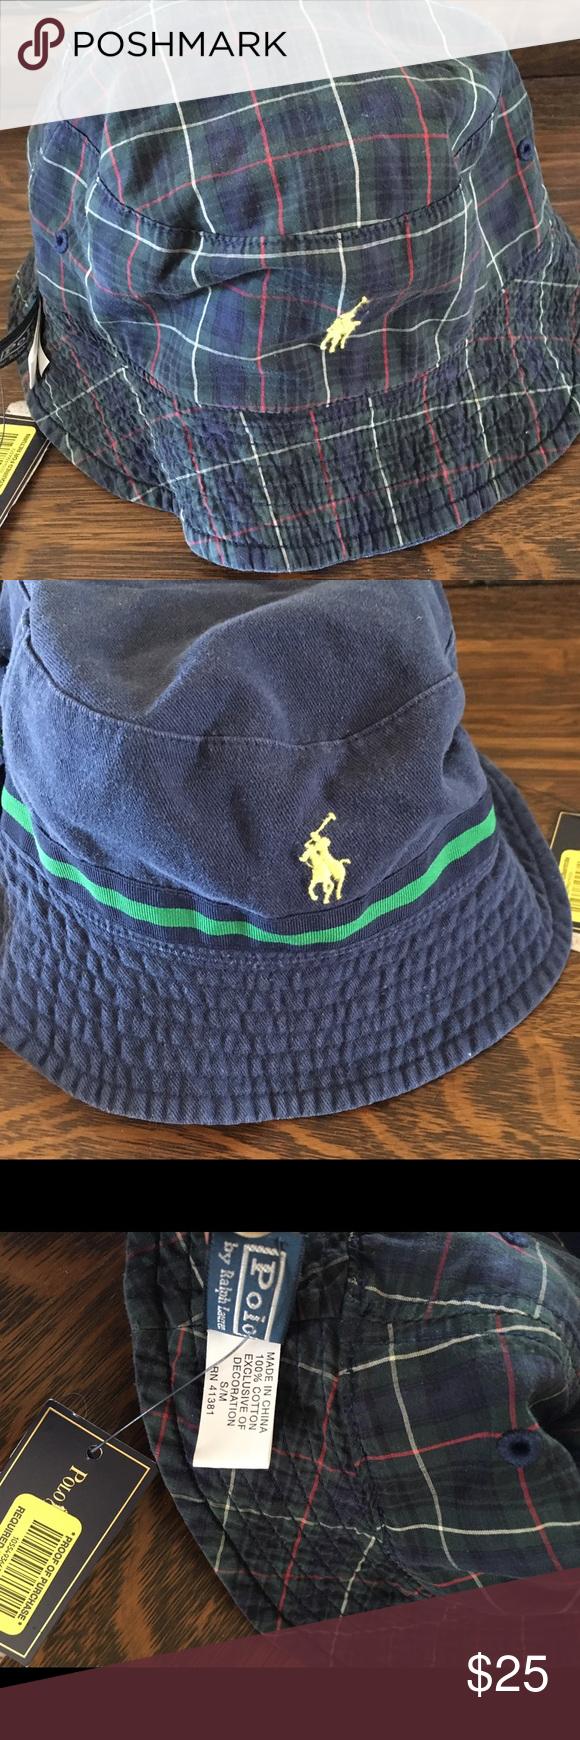 NWT Ralph Lauren bucket hat reversible FAB plaid! NWT